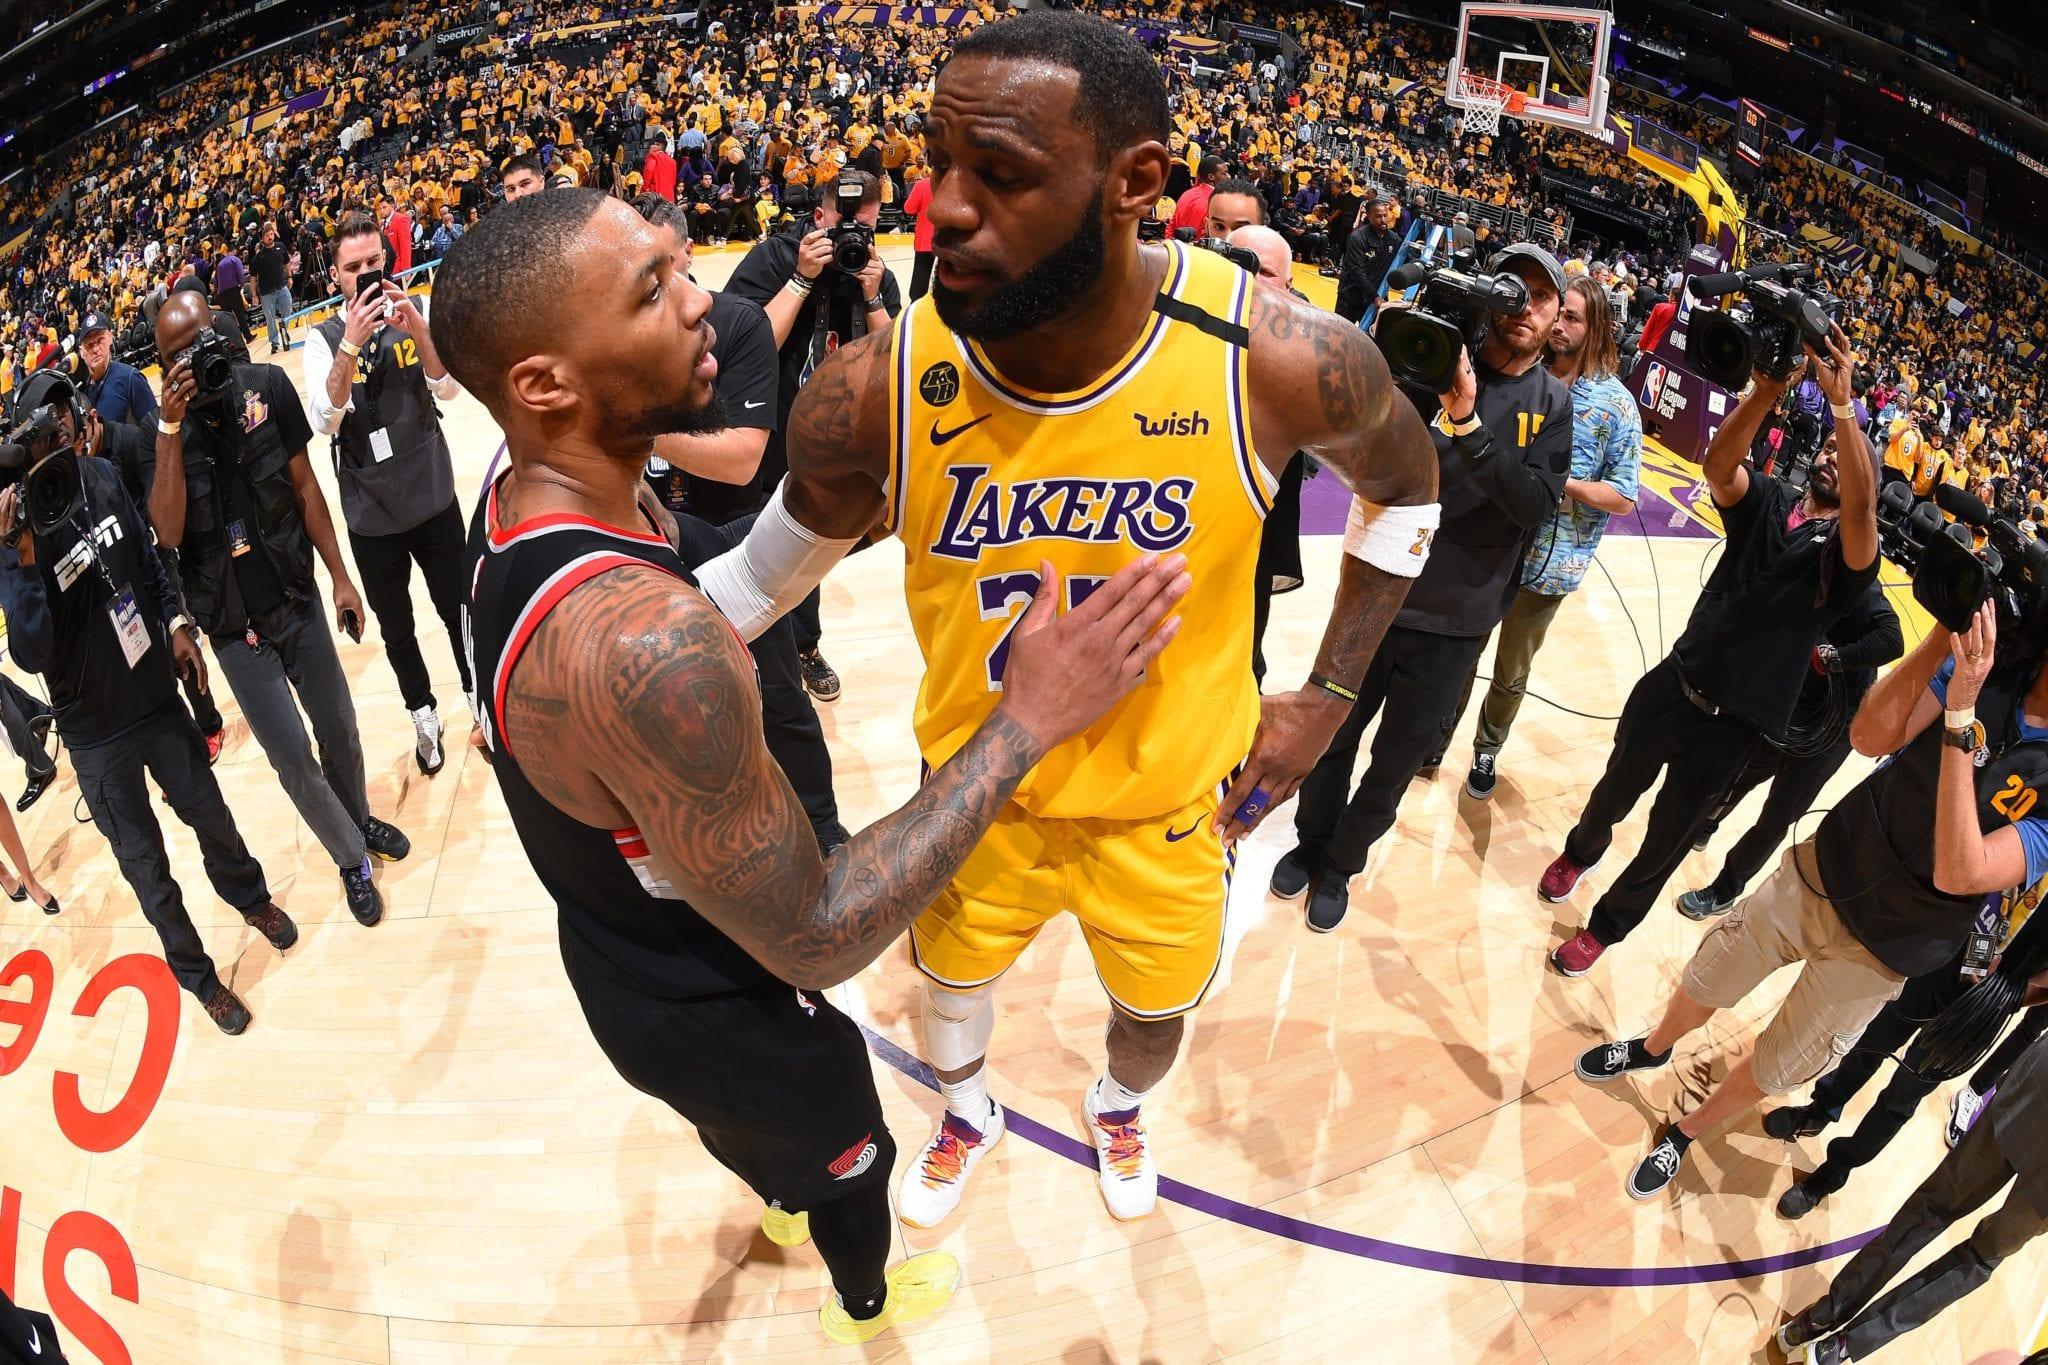 Damian Lillard Says LeBron James Should Be 2019-20 NBA MVP